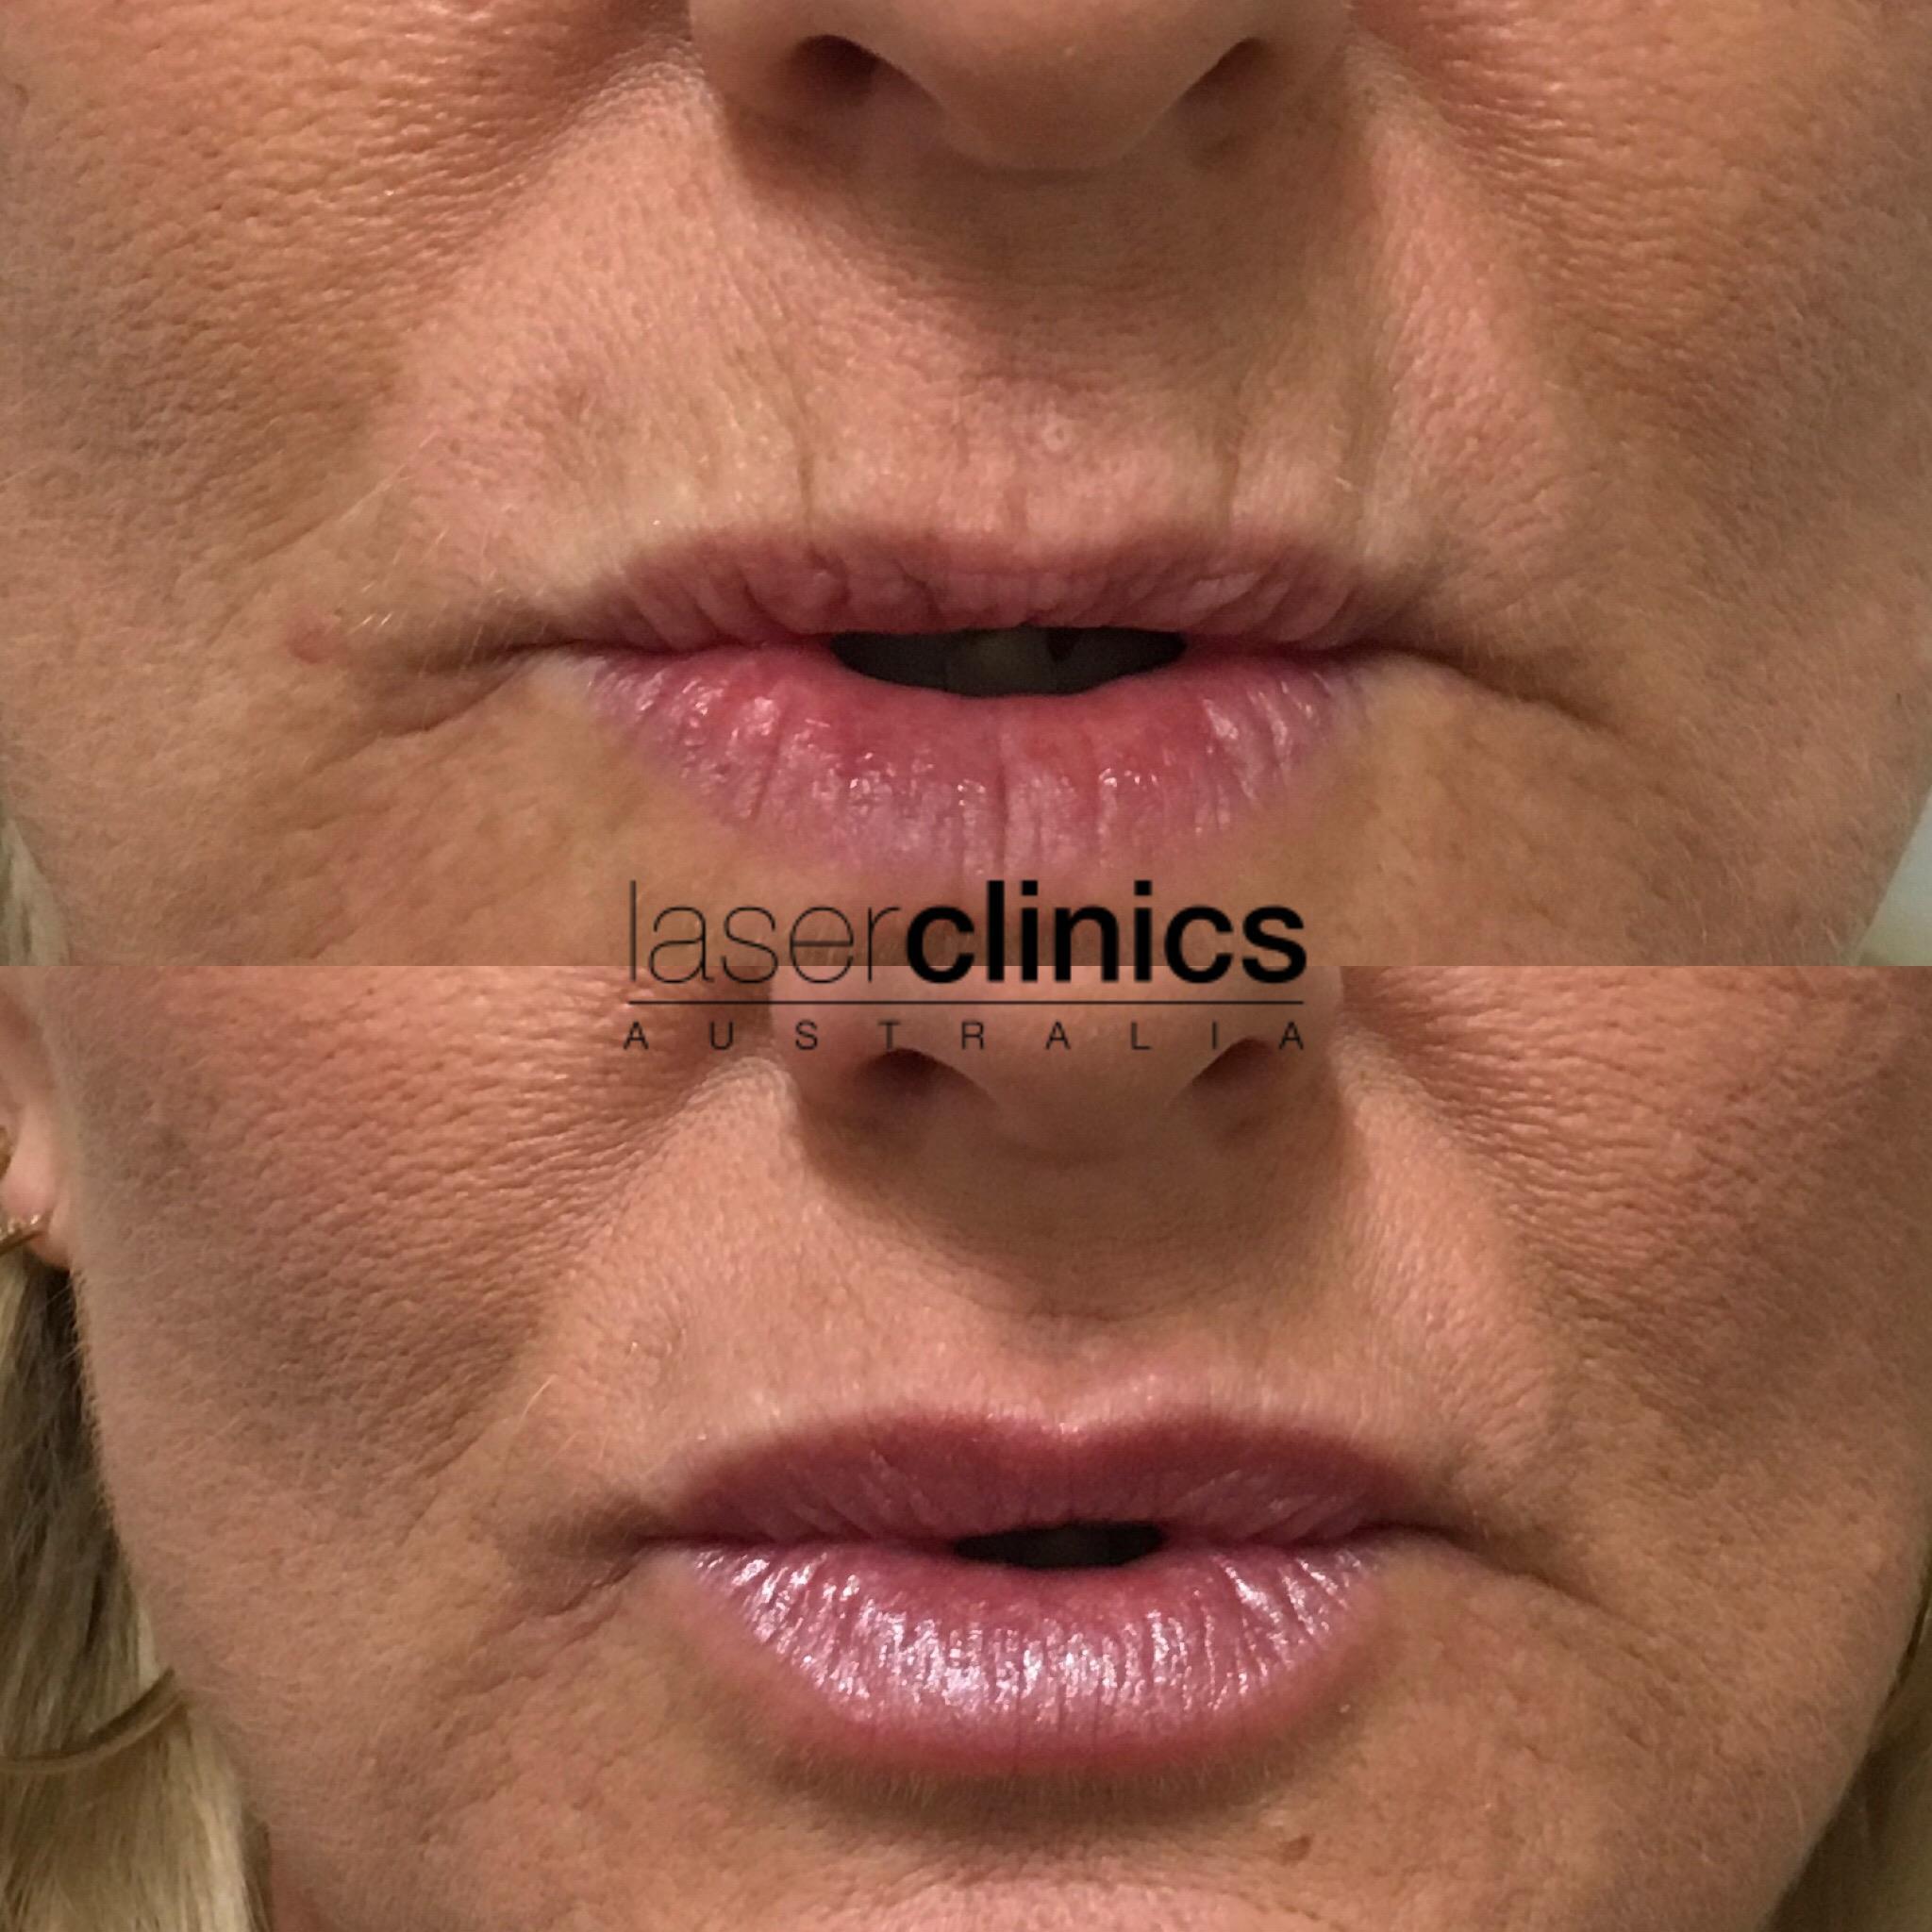 Helensvale Westfield   Laser Clinics Australia